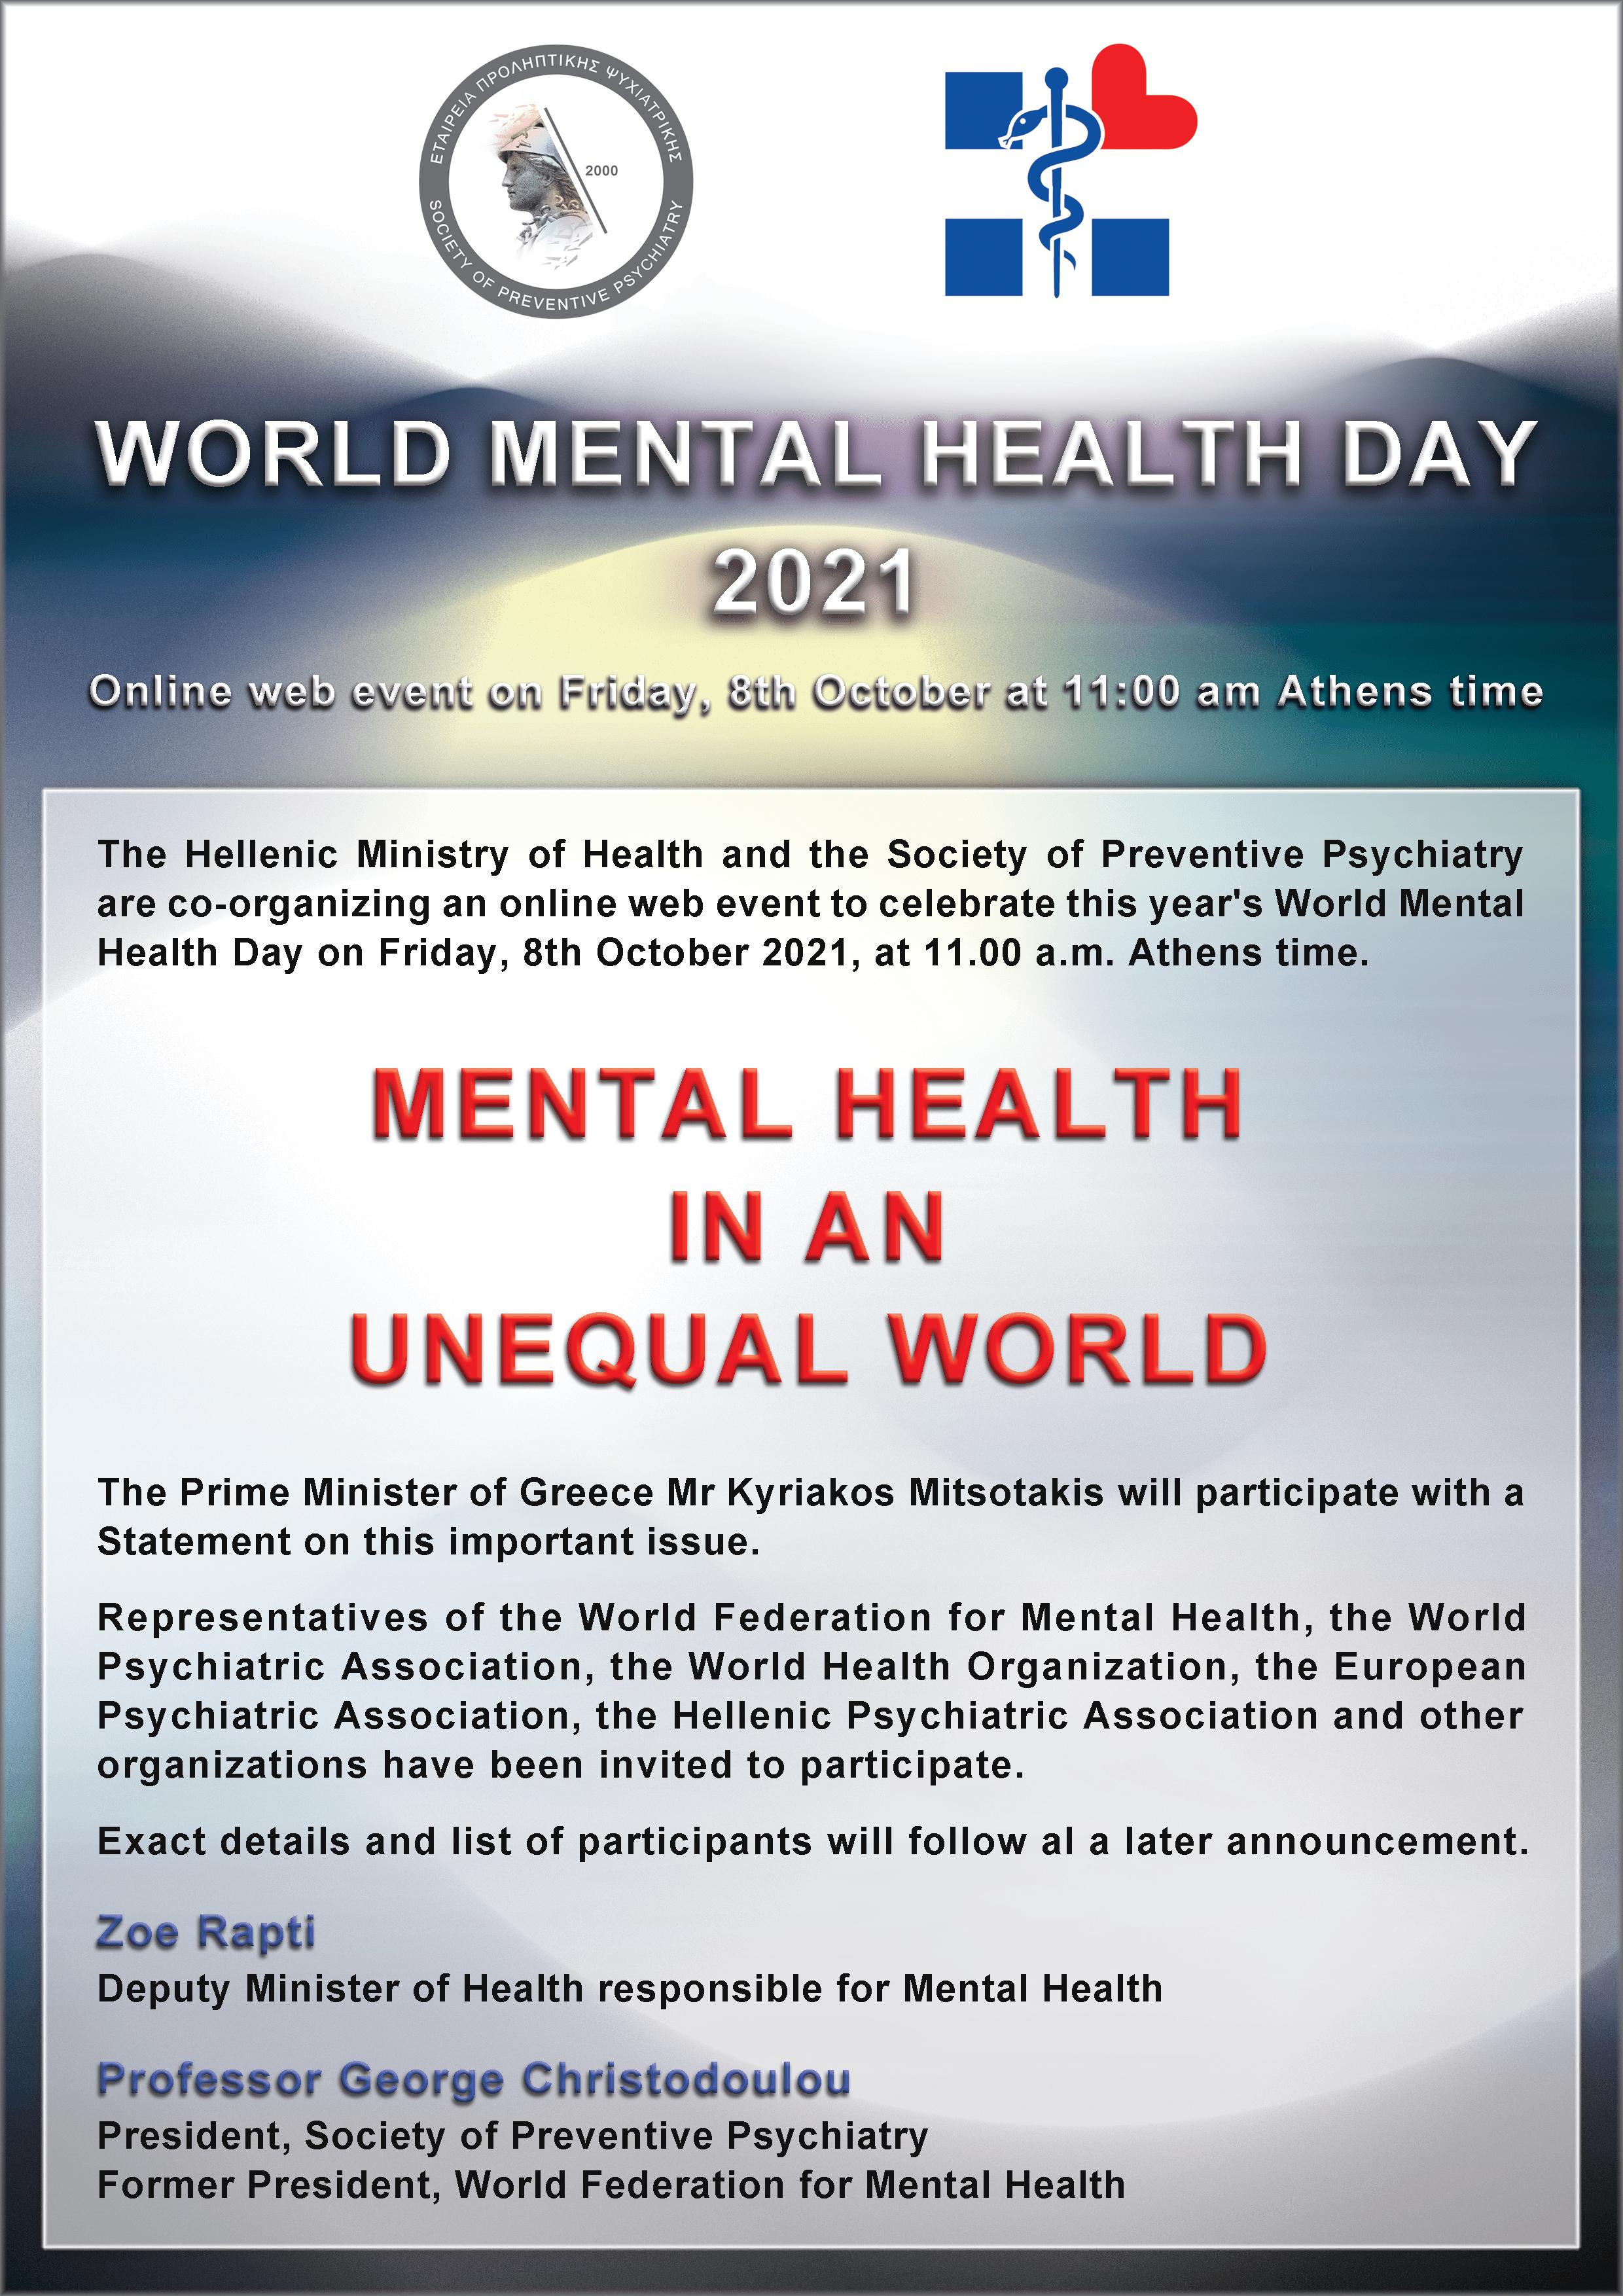 World Mental Health Day 2021 – Preliminary Announcement